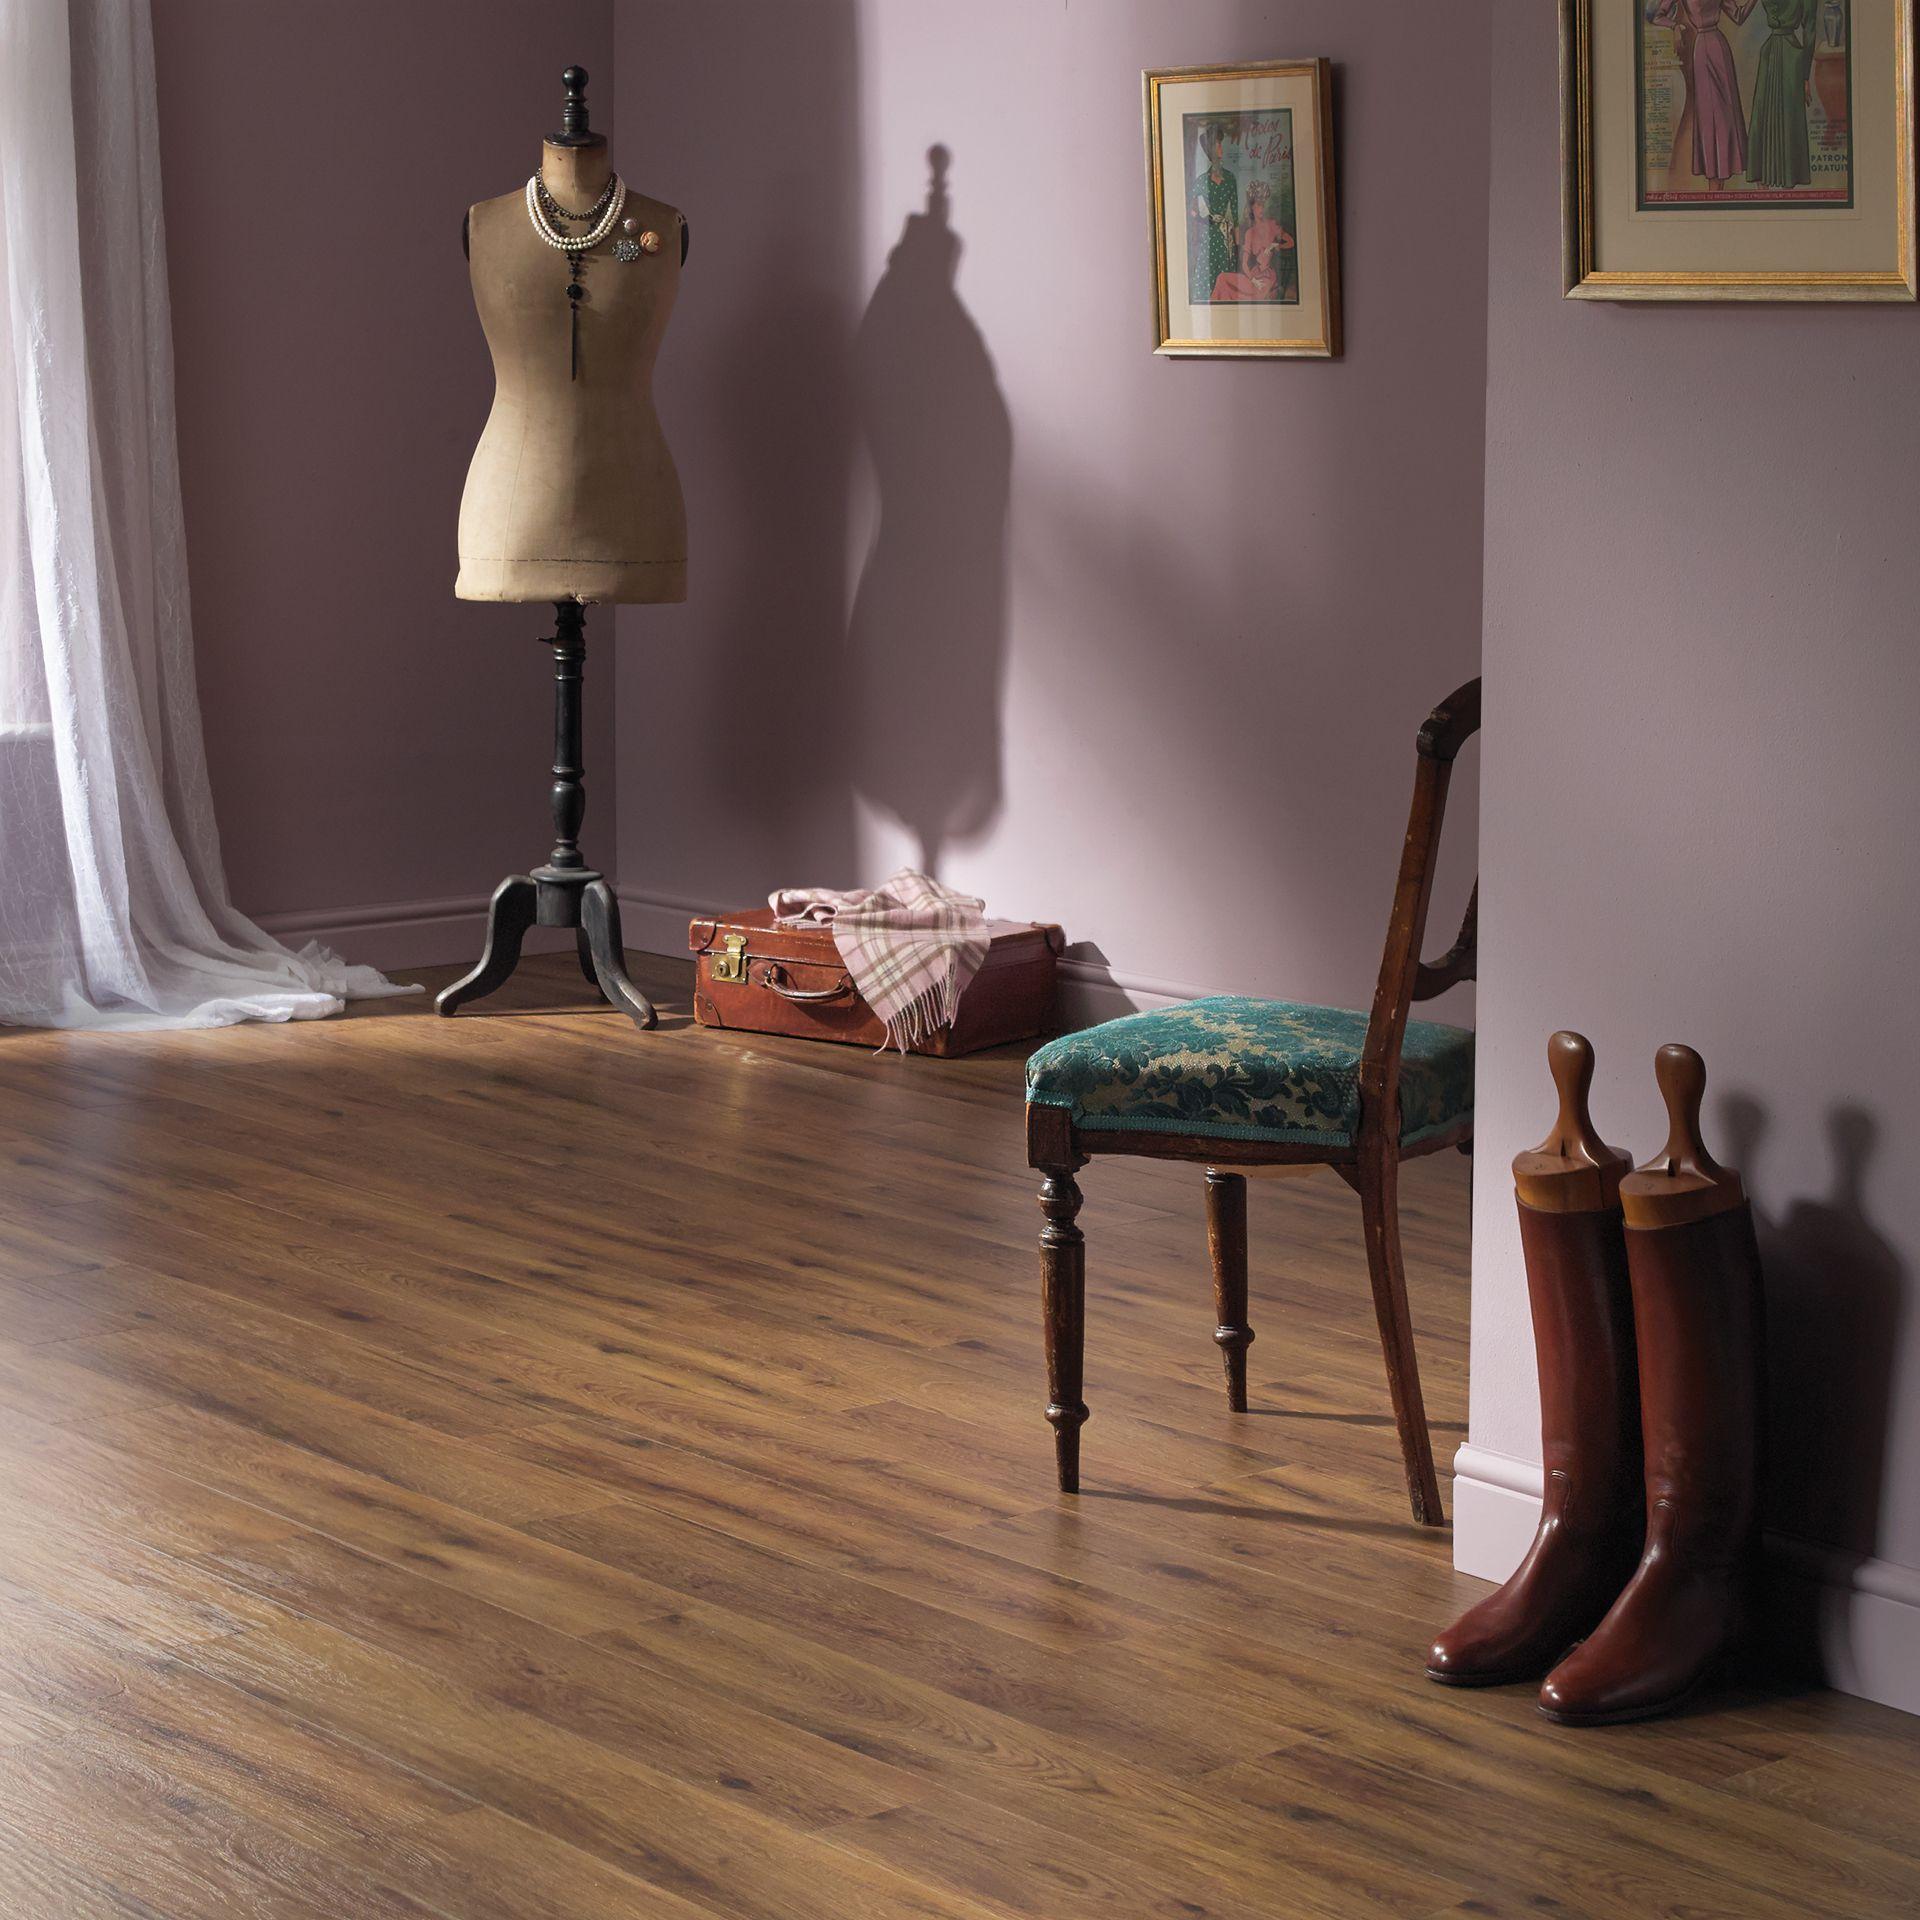 hc02_morning-oak_rs_res_dressing-room_image